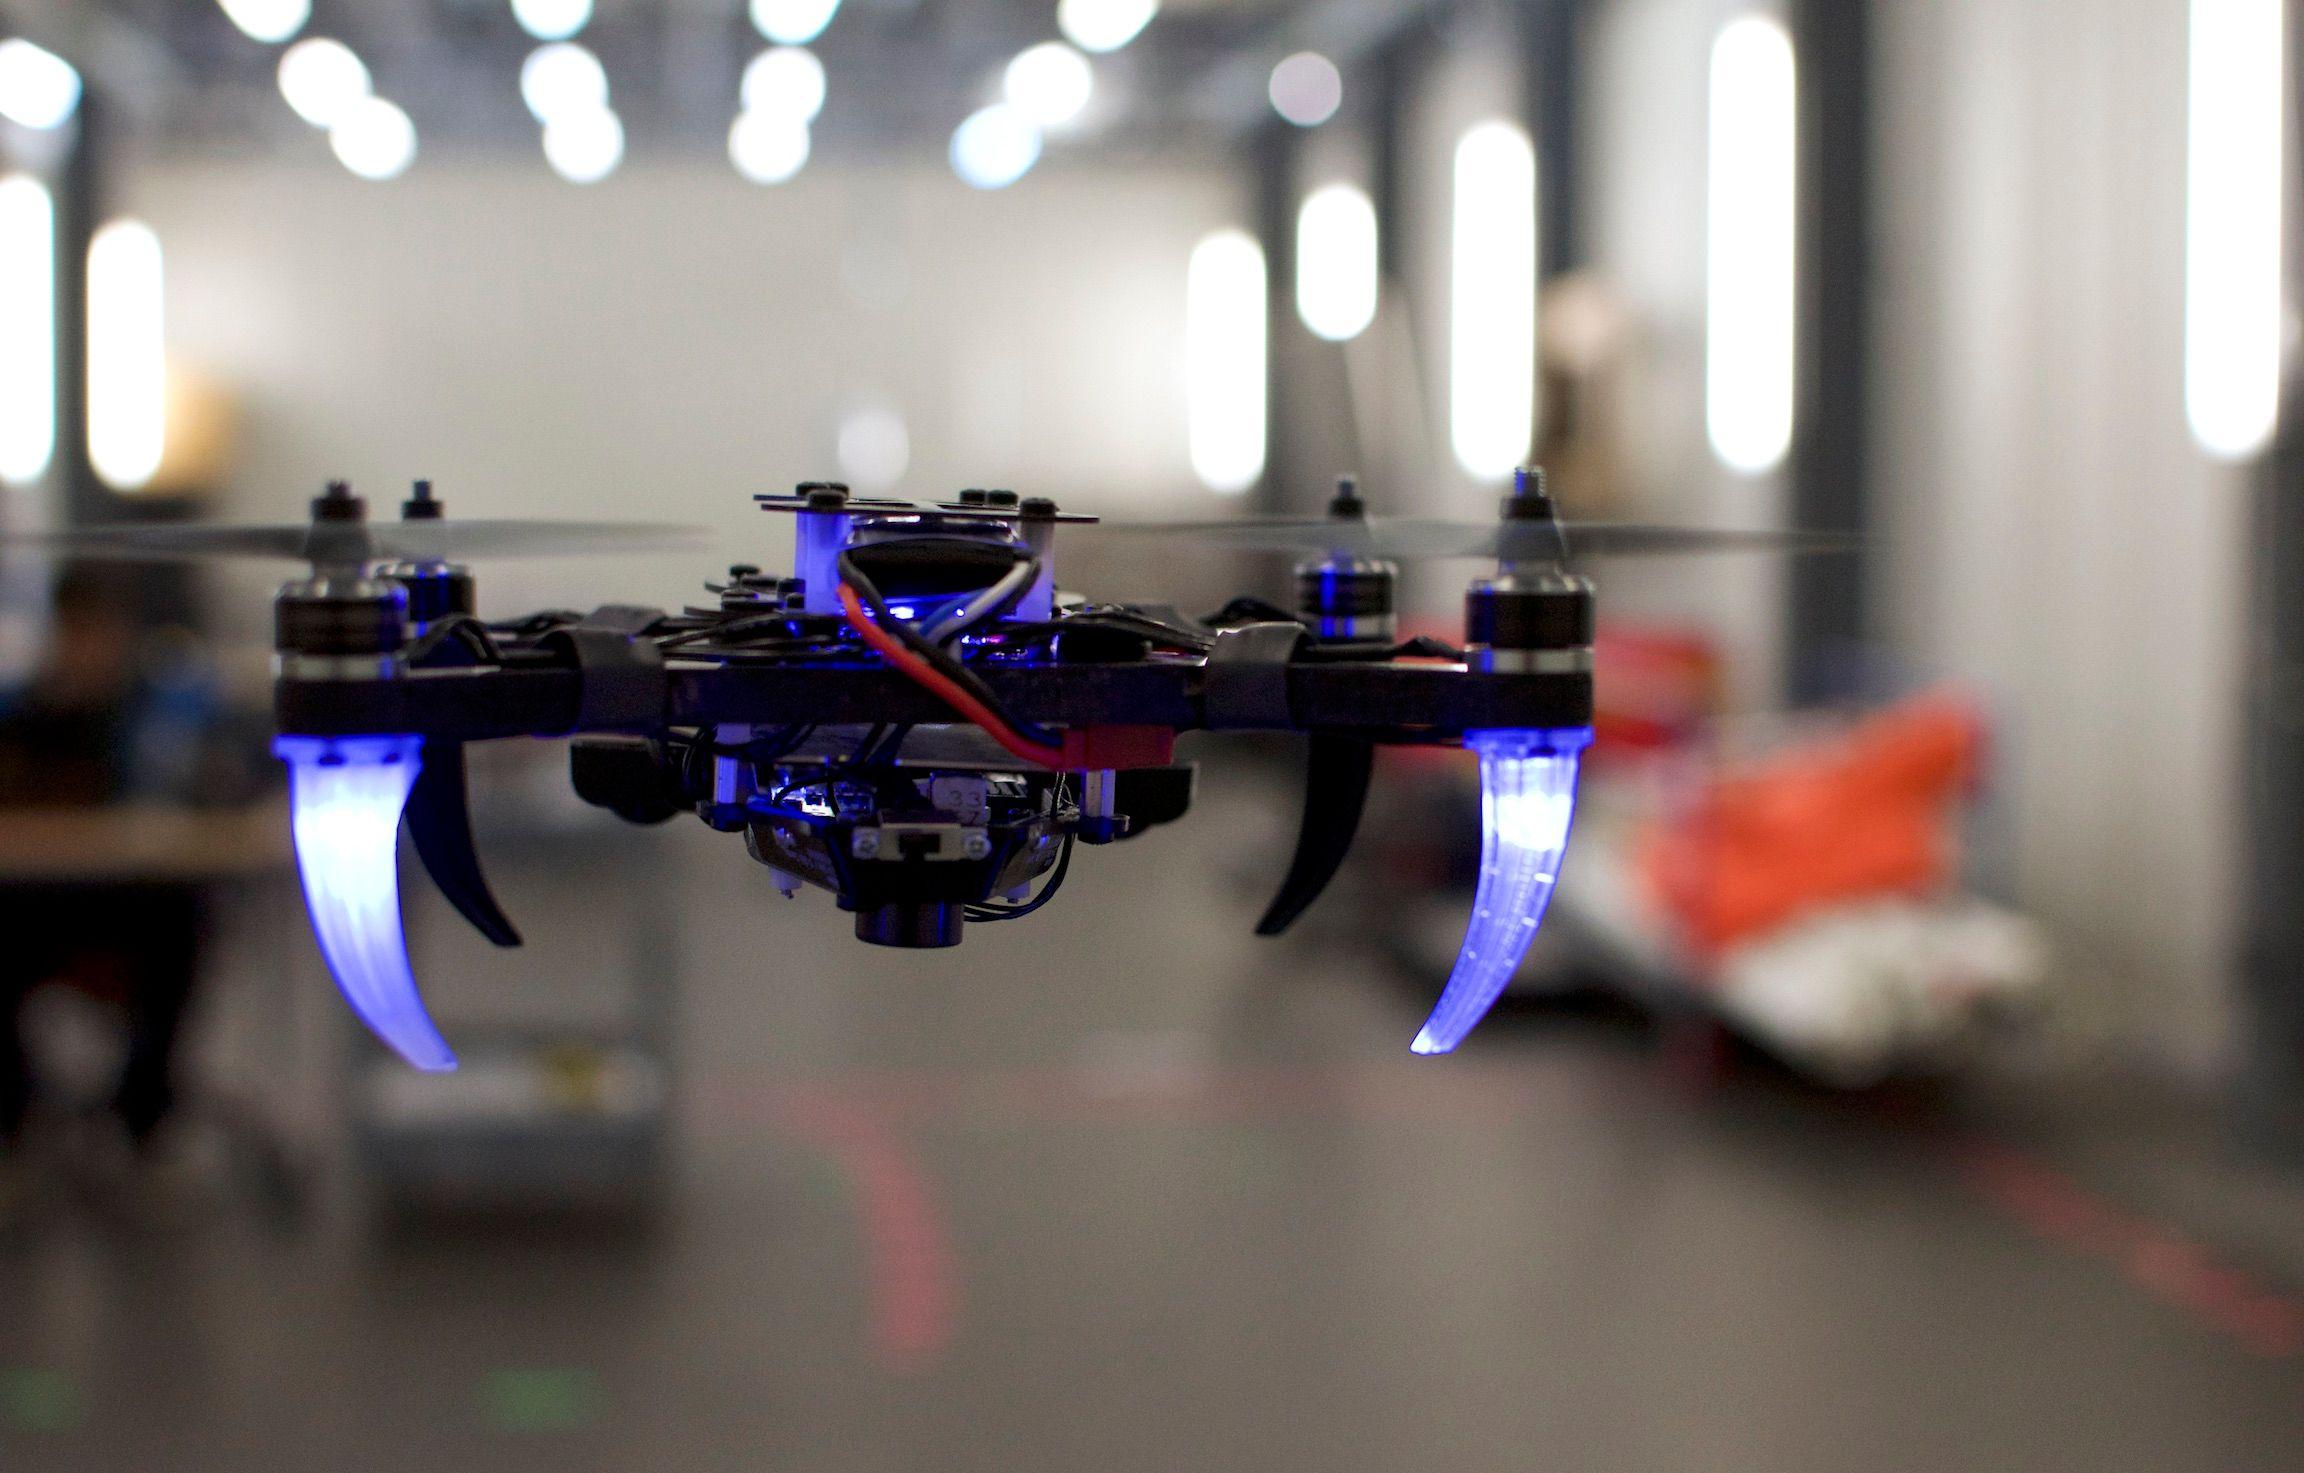 NYU and UPenn eye-tracking controlled drone